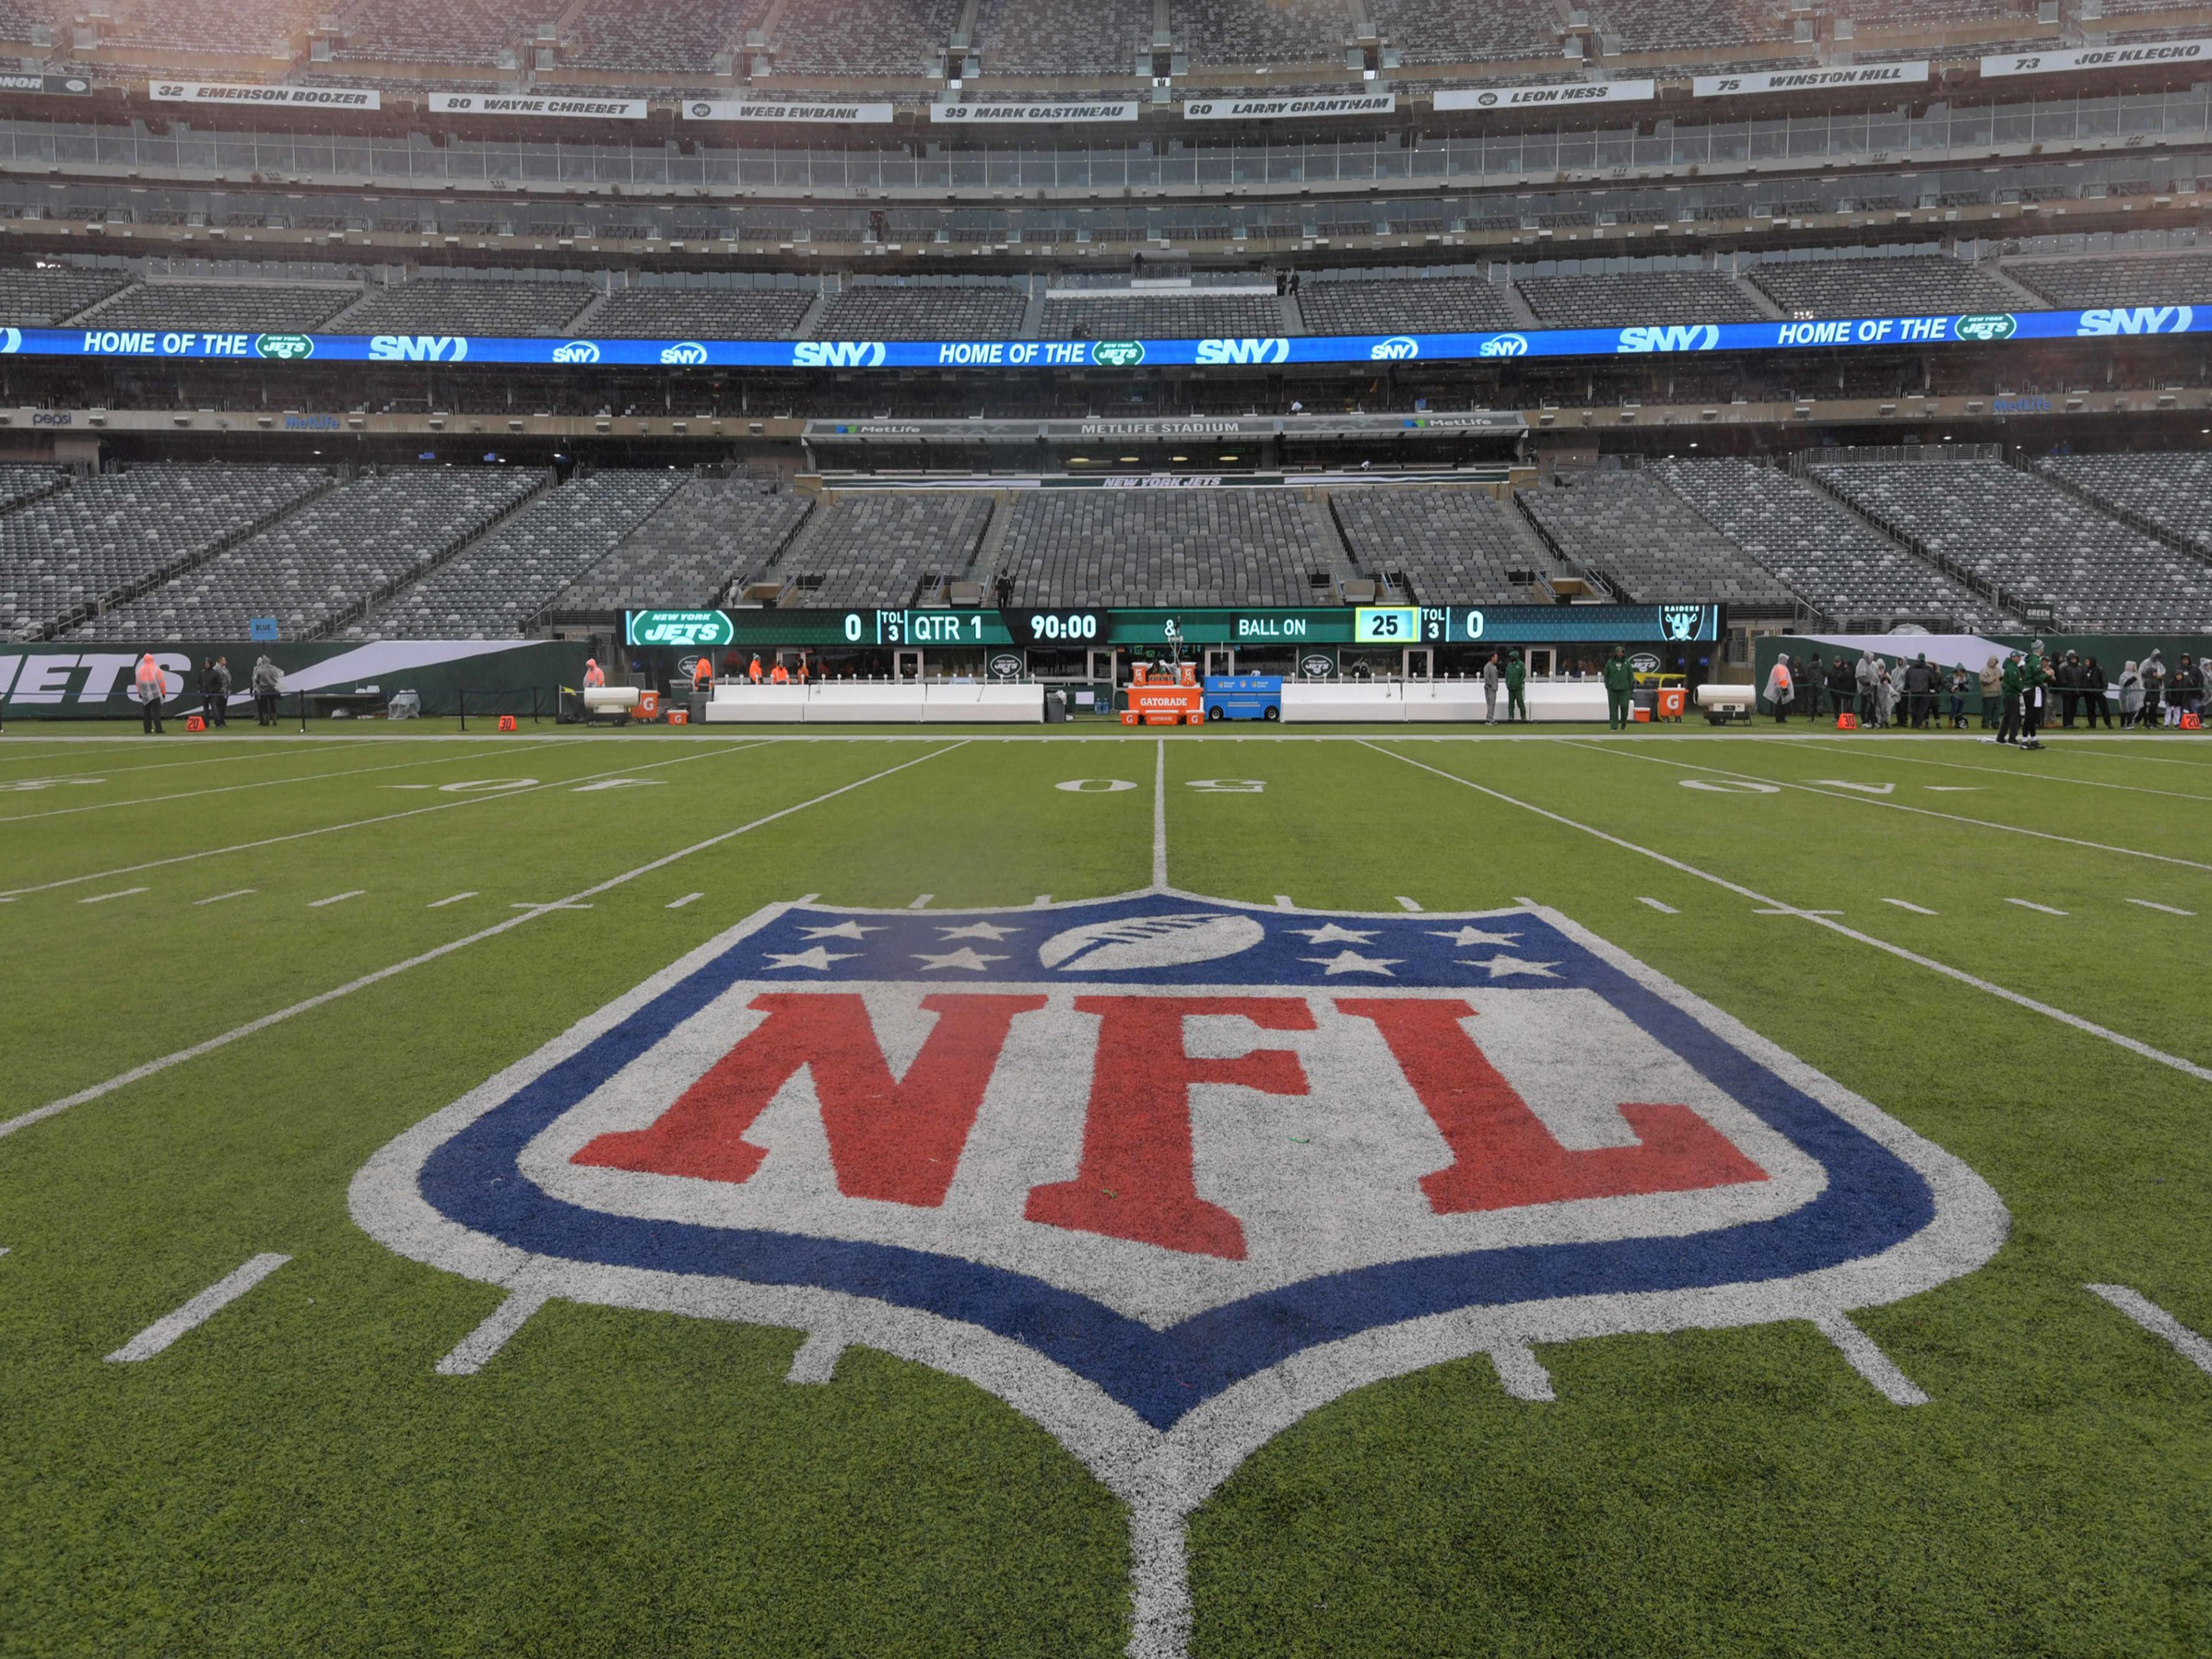 YouTube TV又新增NFL付费内容,皆因比赛太受欢迎